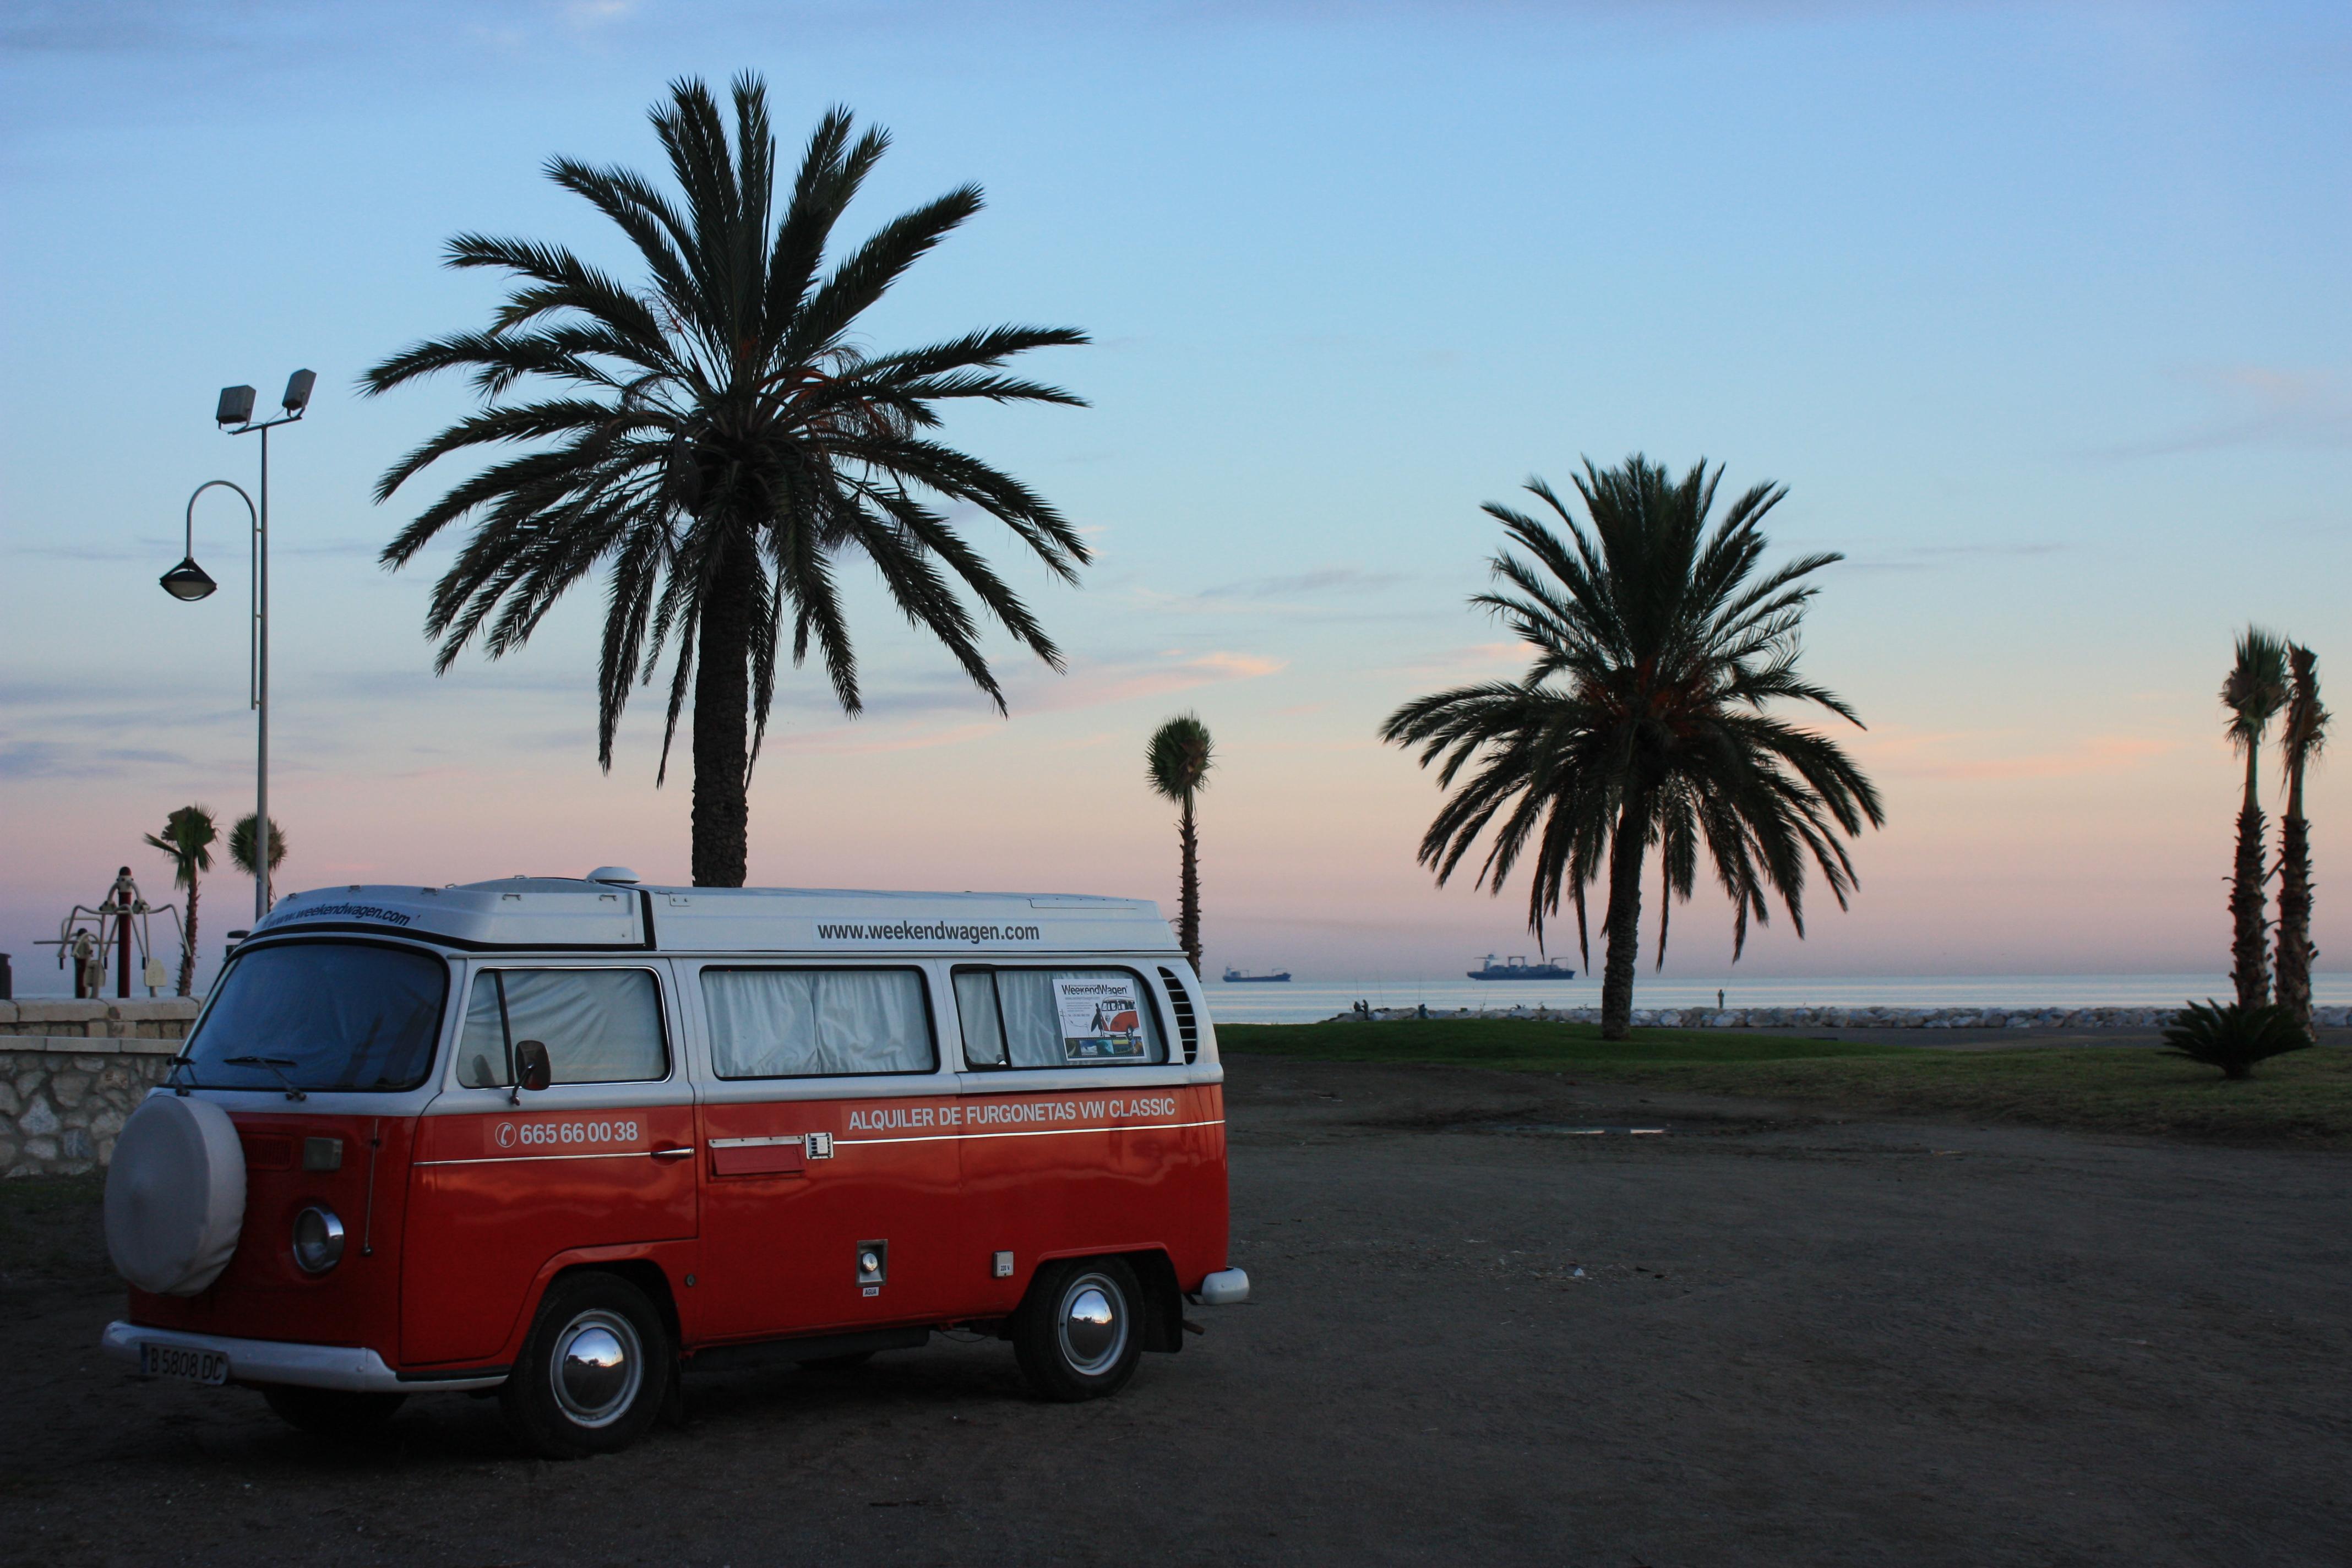 1 vw bus am strand tripodo reiseblogtripodo reiseblog. Black Bedroom Furniture Sets. Home Design Ideas